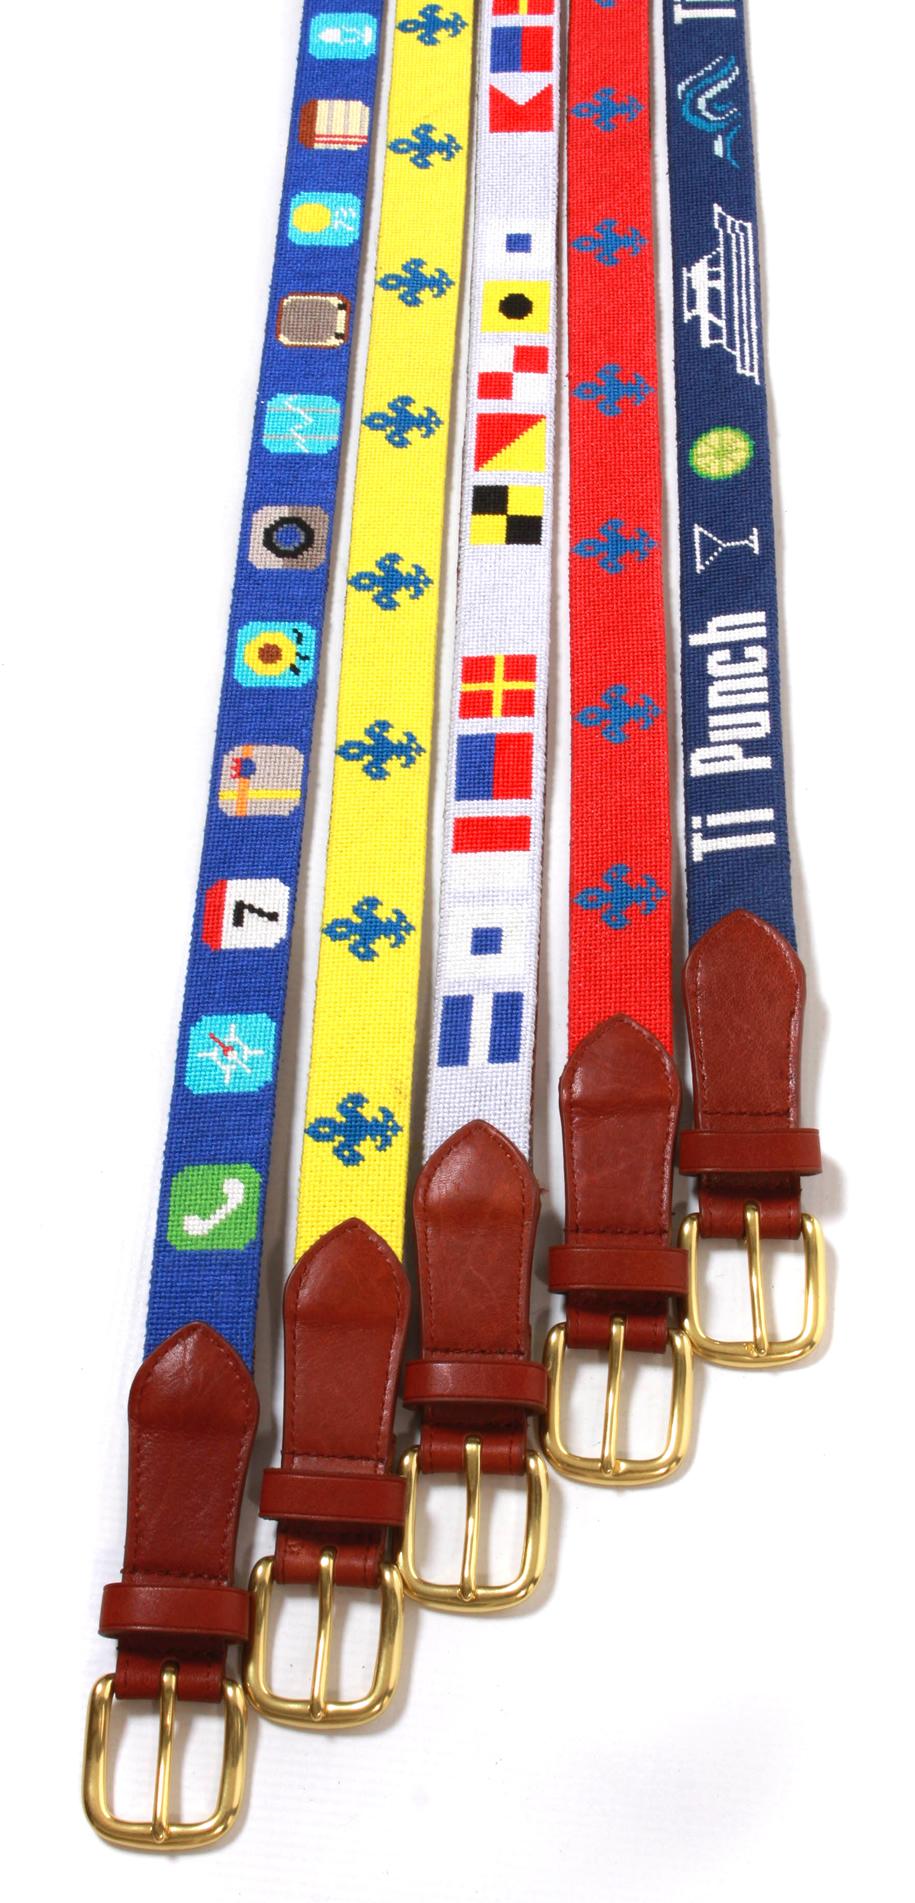 Custom Needlepoint Belts by NeedlePaint